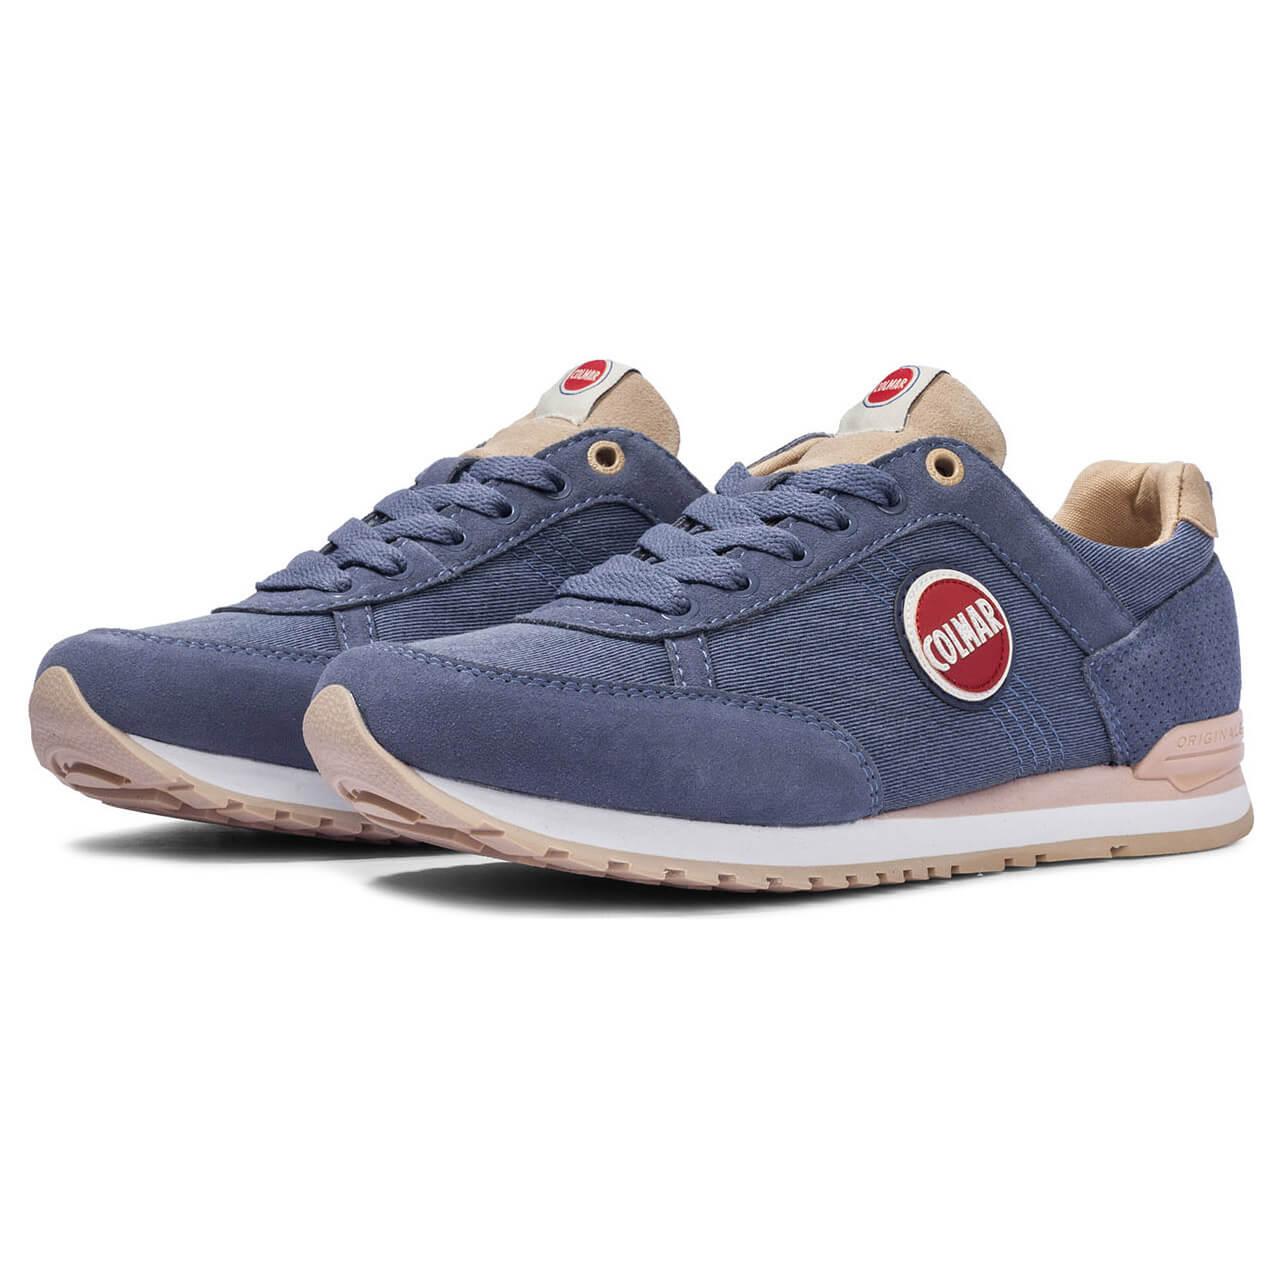 Colmar Originals - Women's Travis Colors - Sneaker Gr 36 blau mDDbb